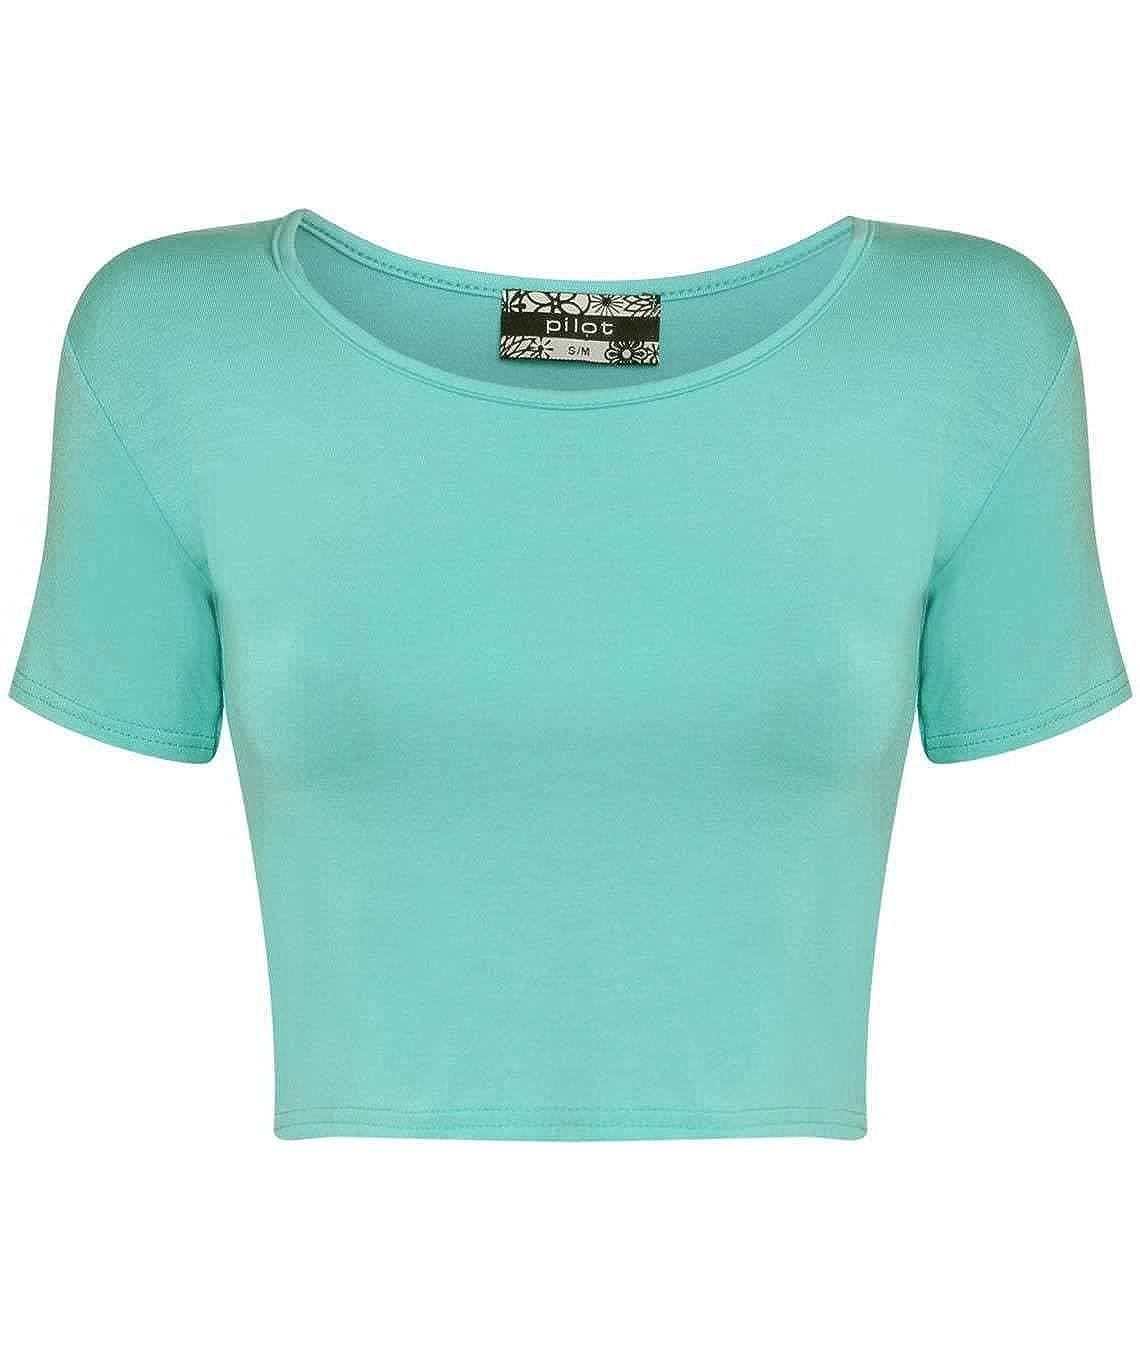 f60554c1d0c Pilot Mia Plain Cap Sleeve Crop Top Aqua Blue, size M/L: Amazon.in:  Clothing & Accessories